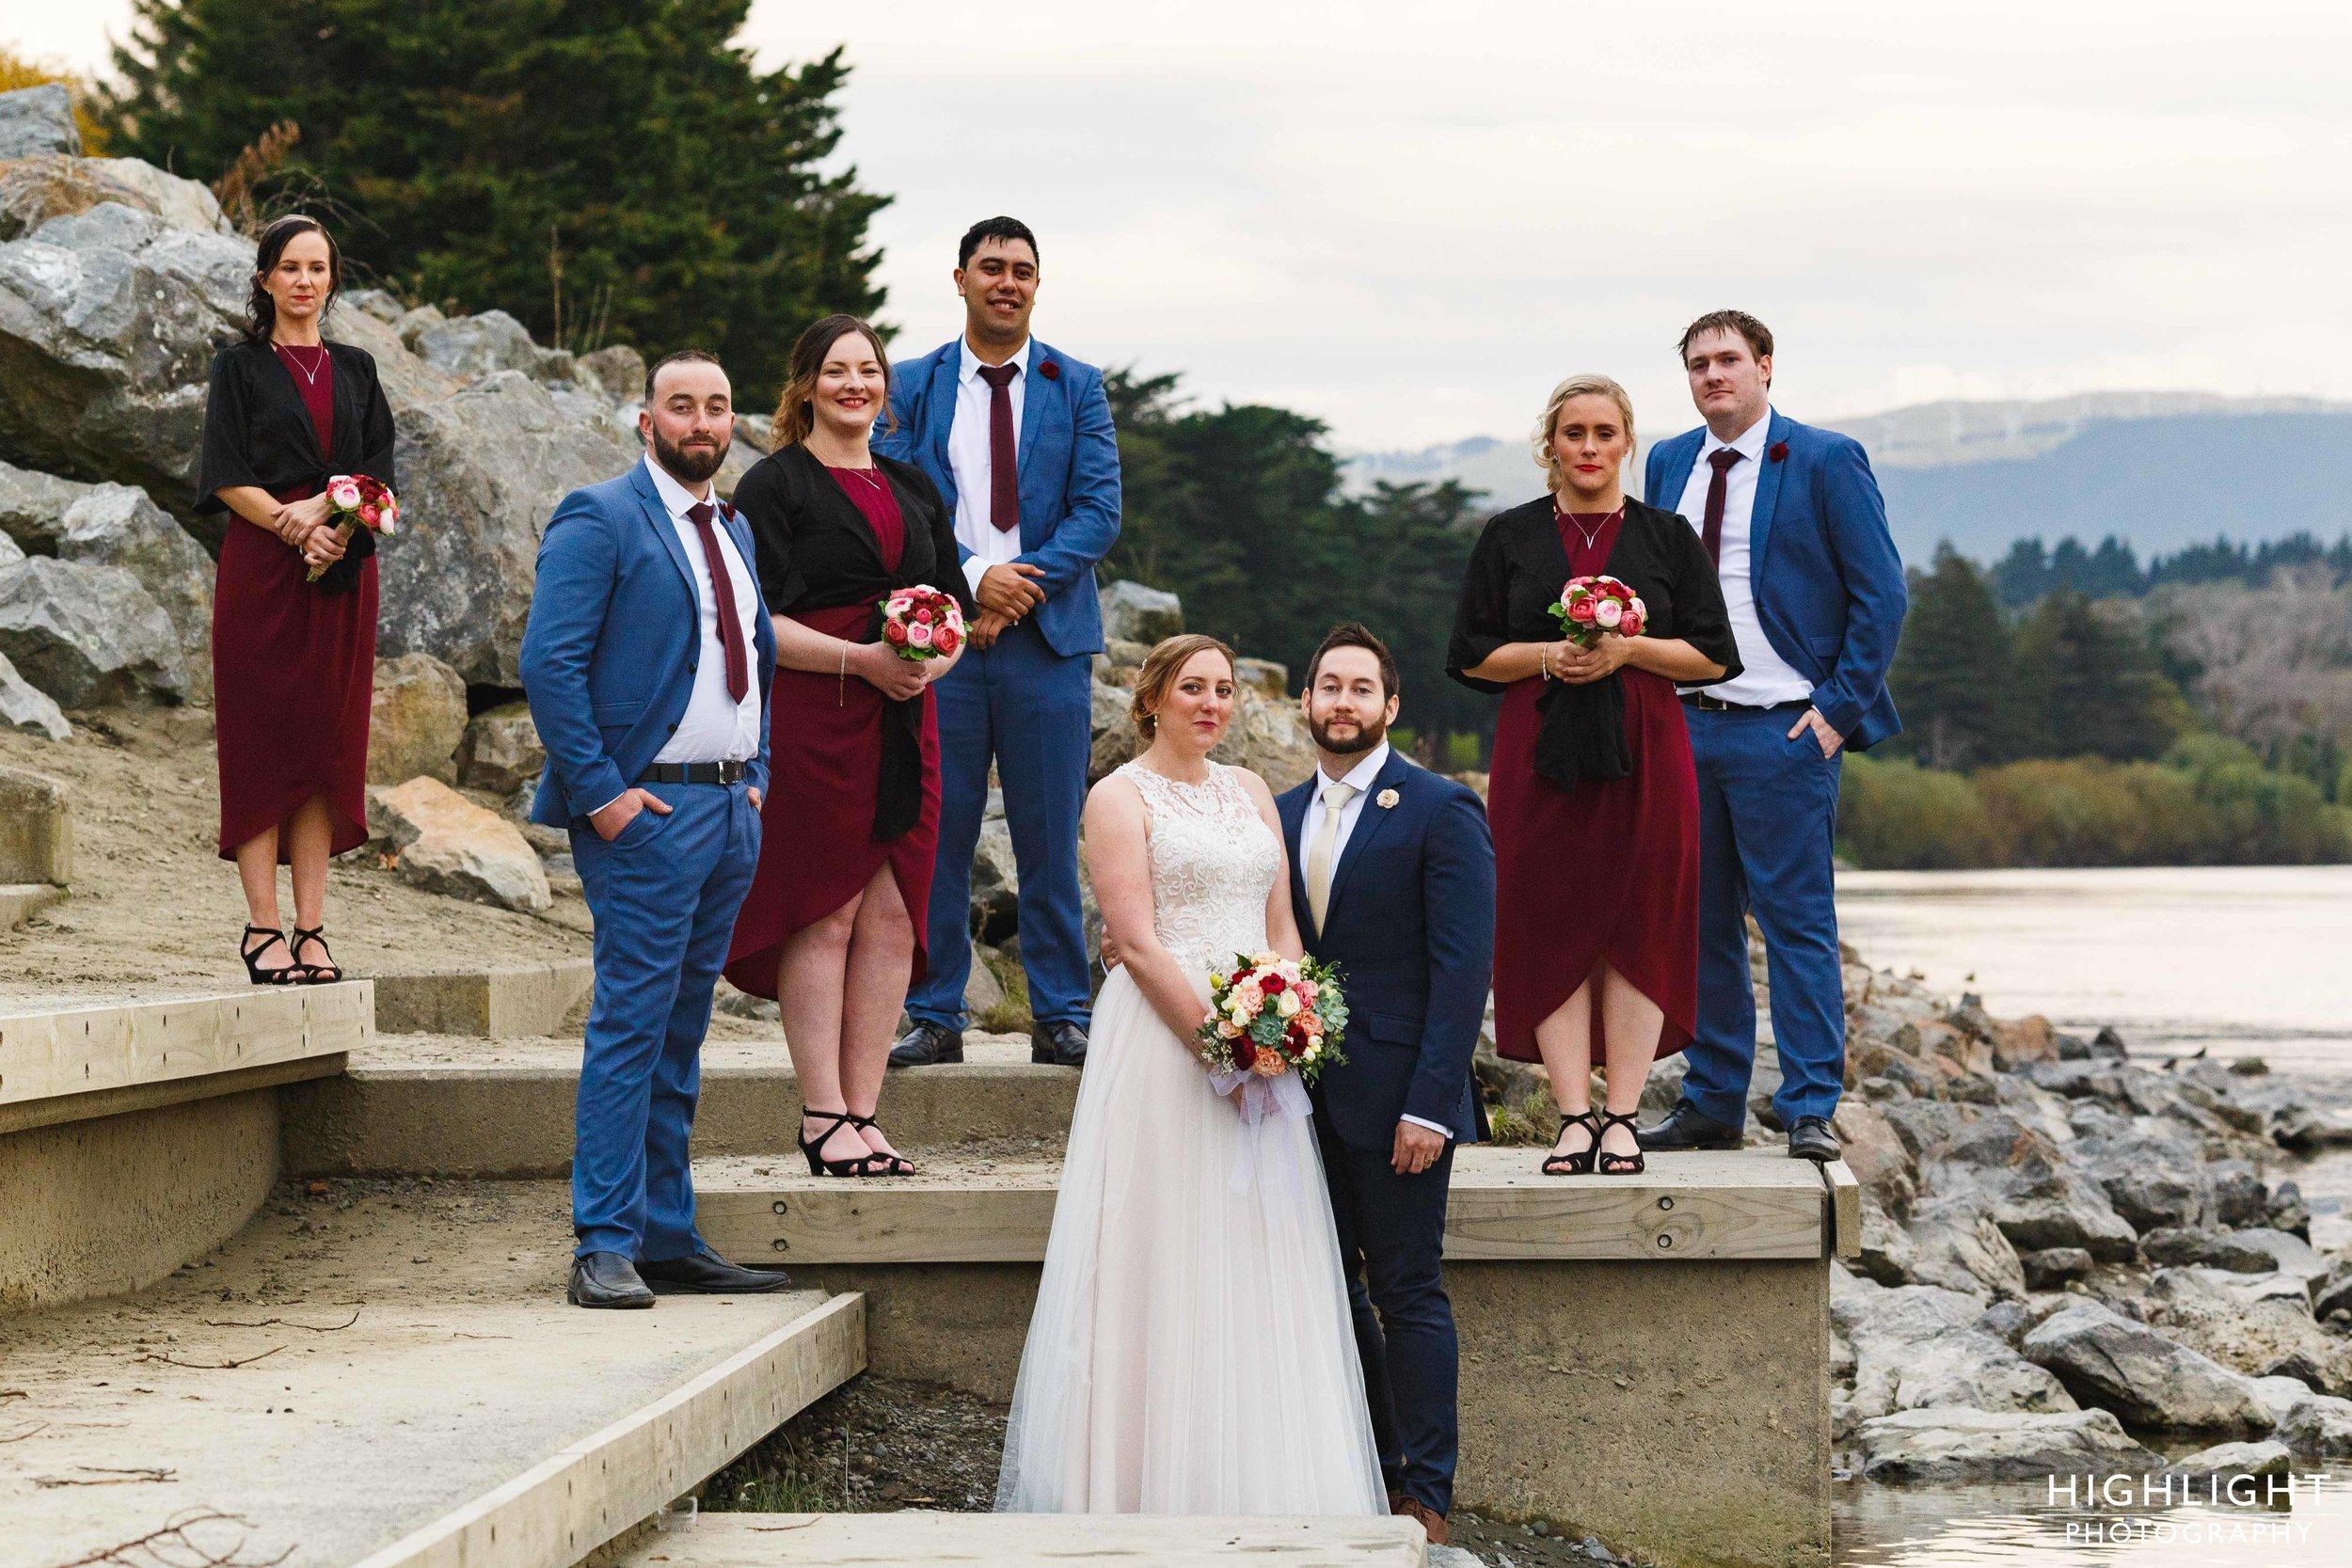 highlight-wedding-photography-palmerston-north-new-zealand-manawatu-chalet-95.jpg